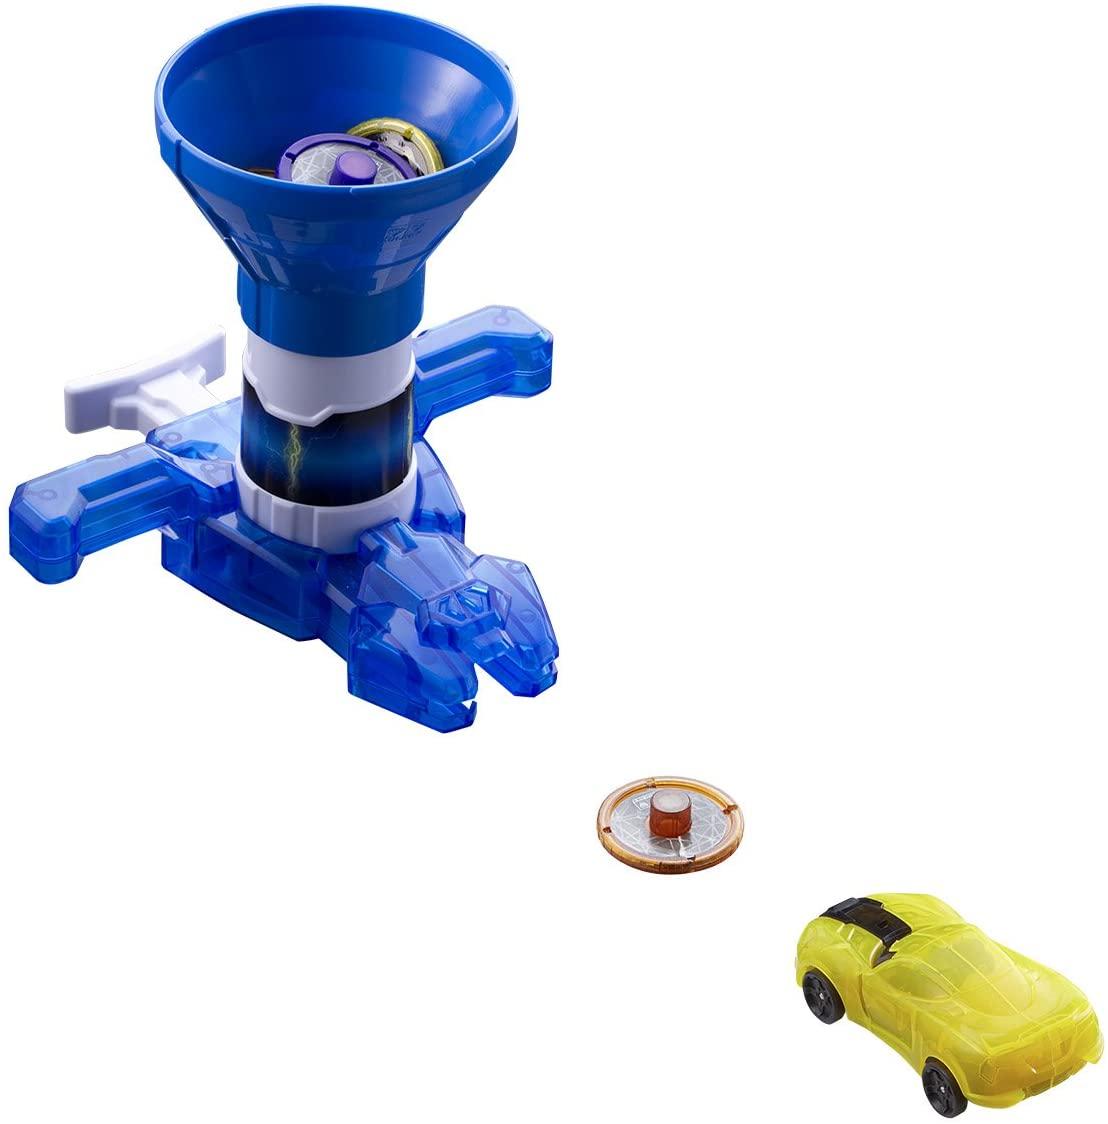 Screechers Wild - US683153 Rapid Fire Disc Blaster Flipping Morphing Toy Car Vehicle, Blue, 6'' x 5''